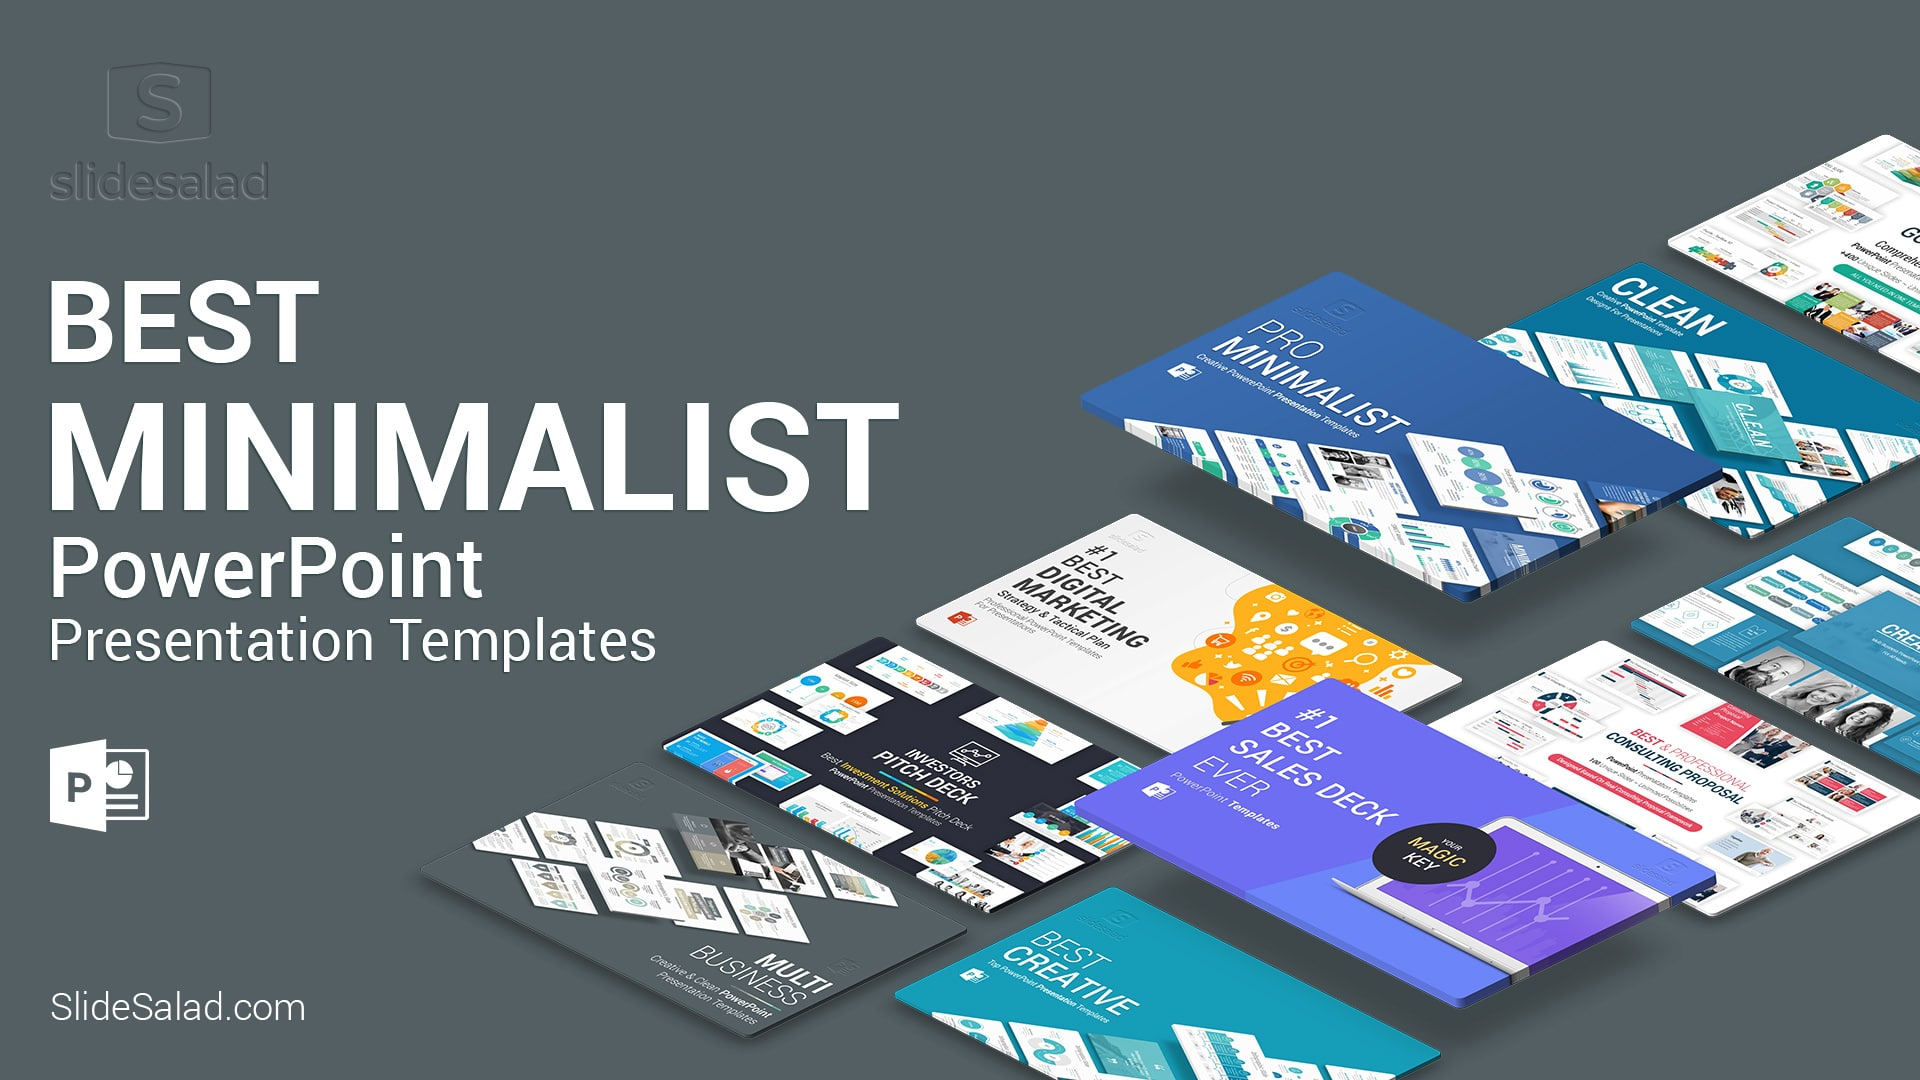 Minimalist PowerPoint Presentation Templates